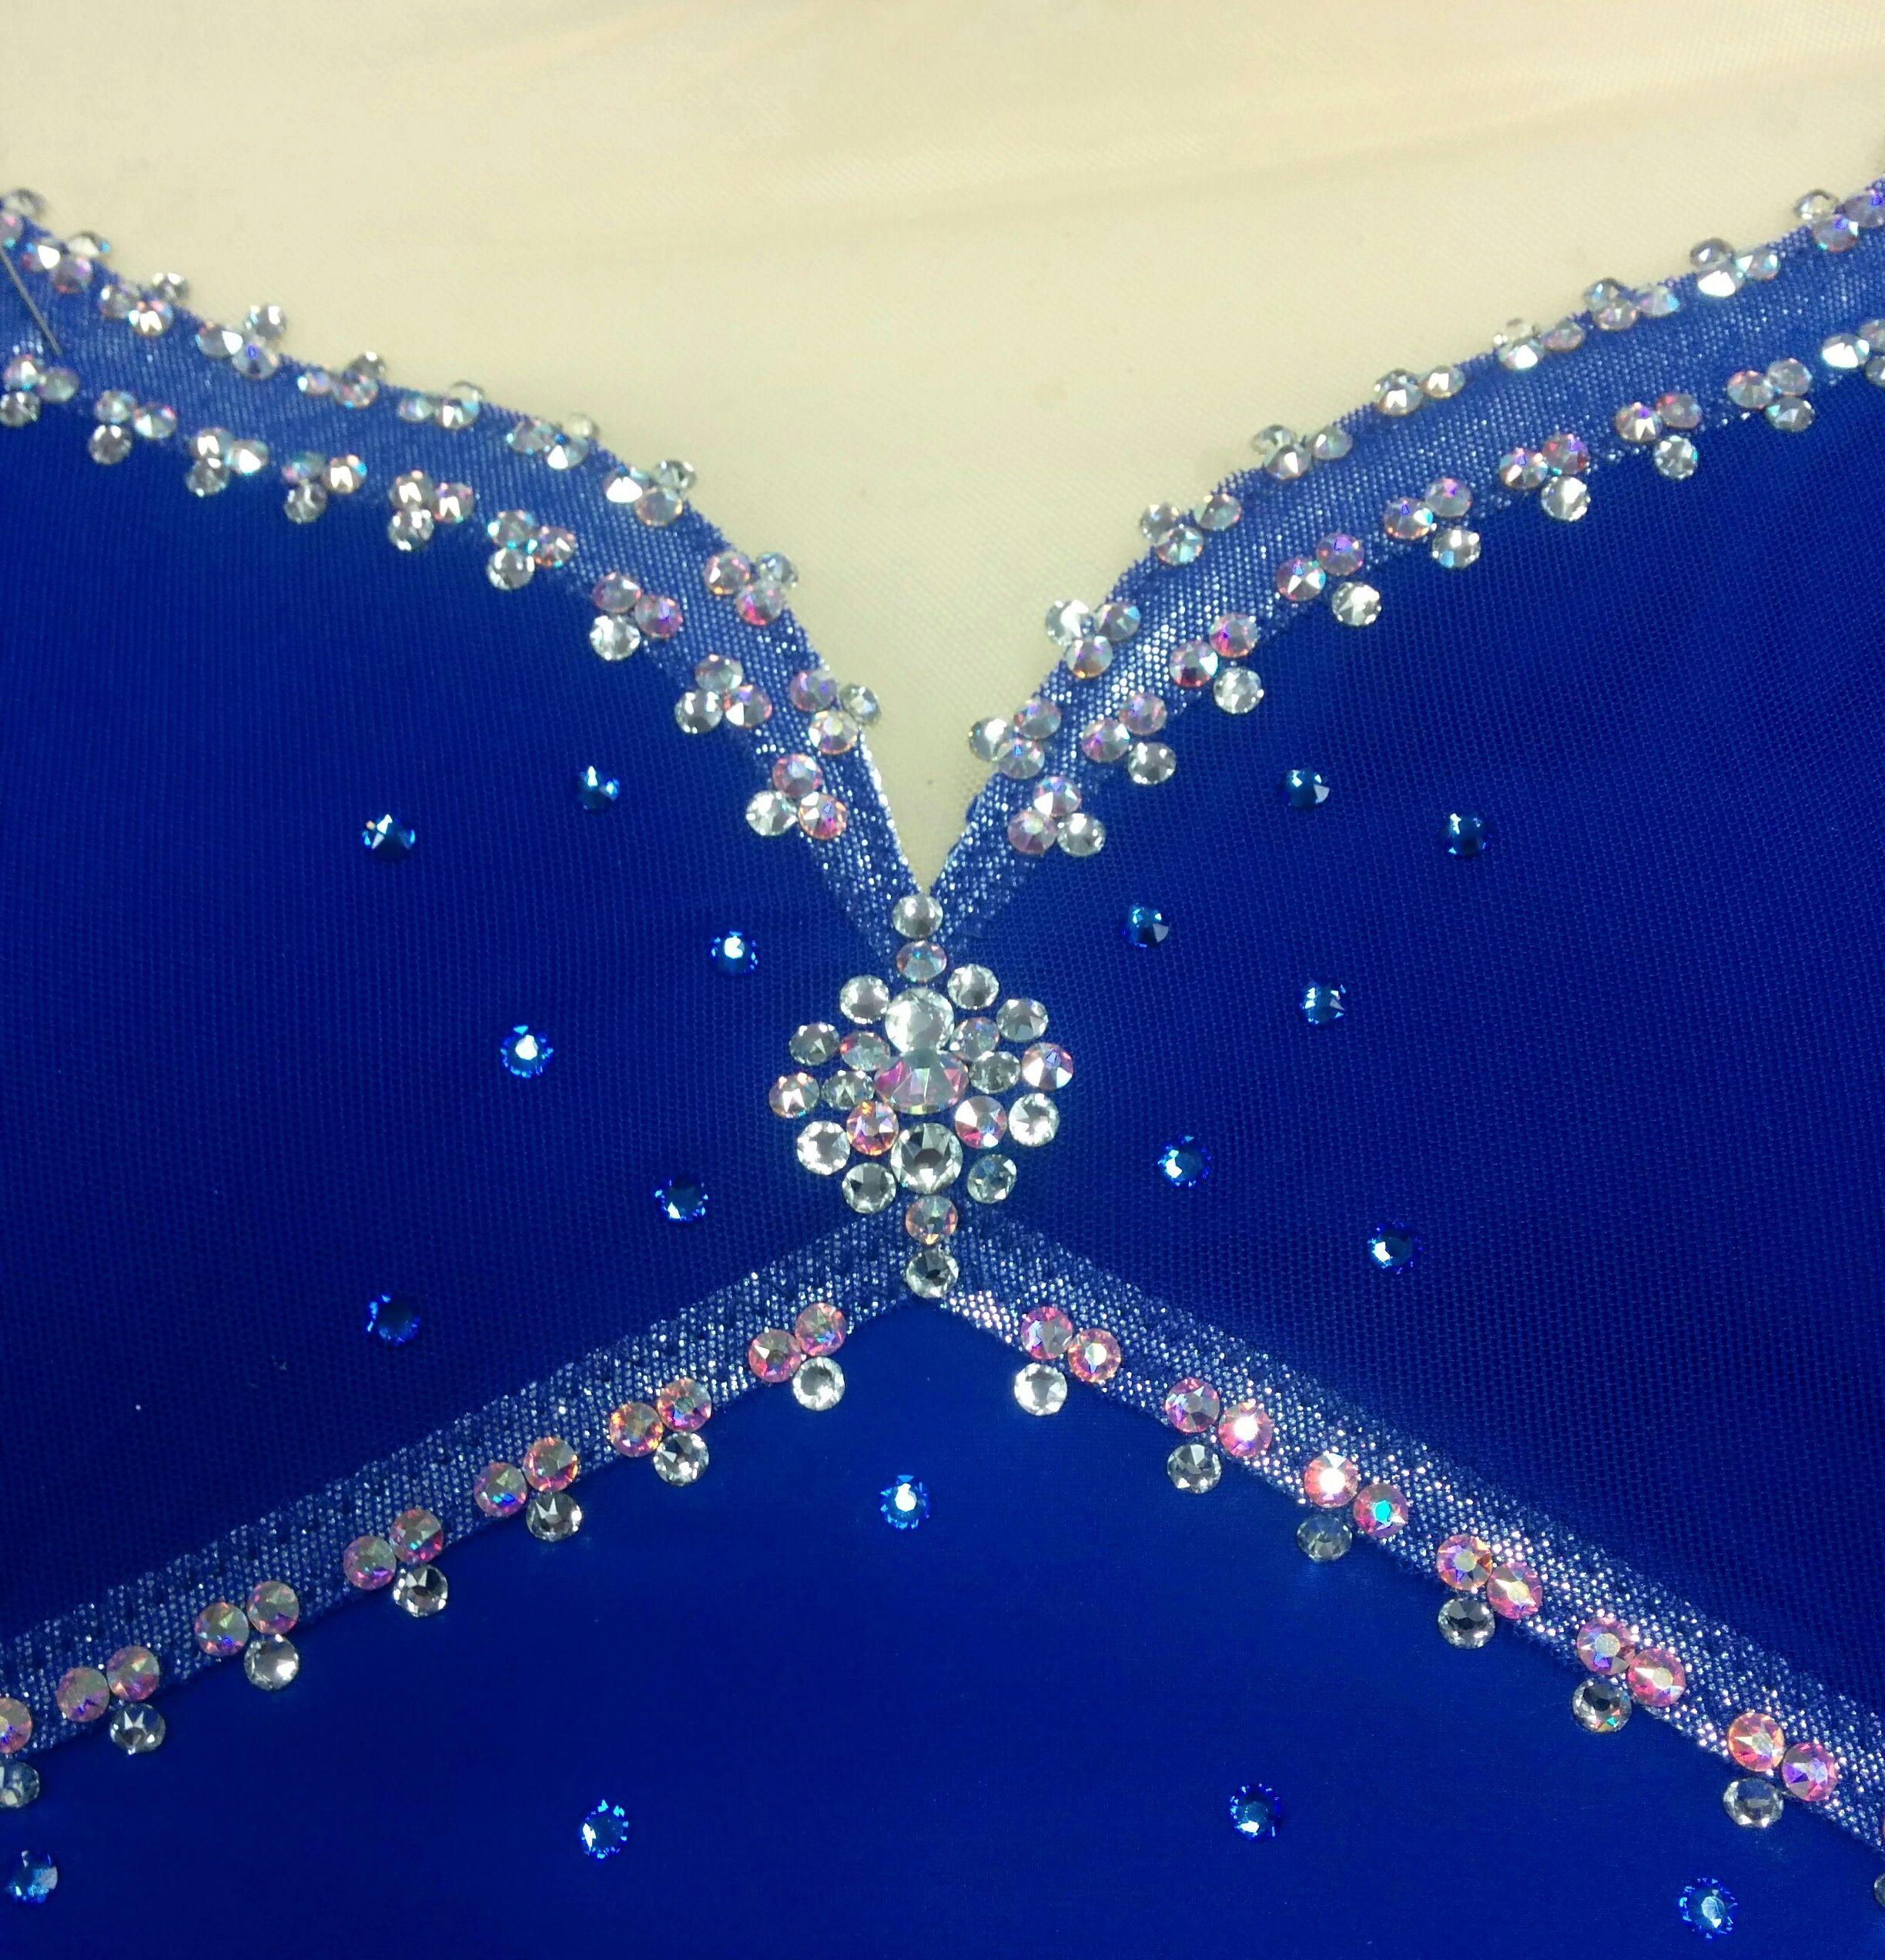 Www Sk8gr8designs Com Swarovski Rhinestones On A Sapphire Blue